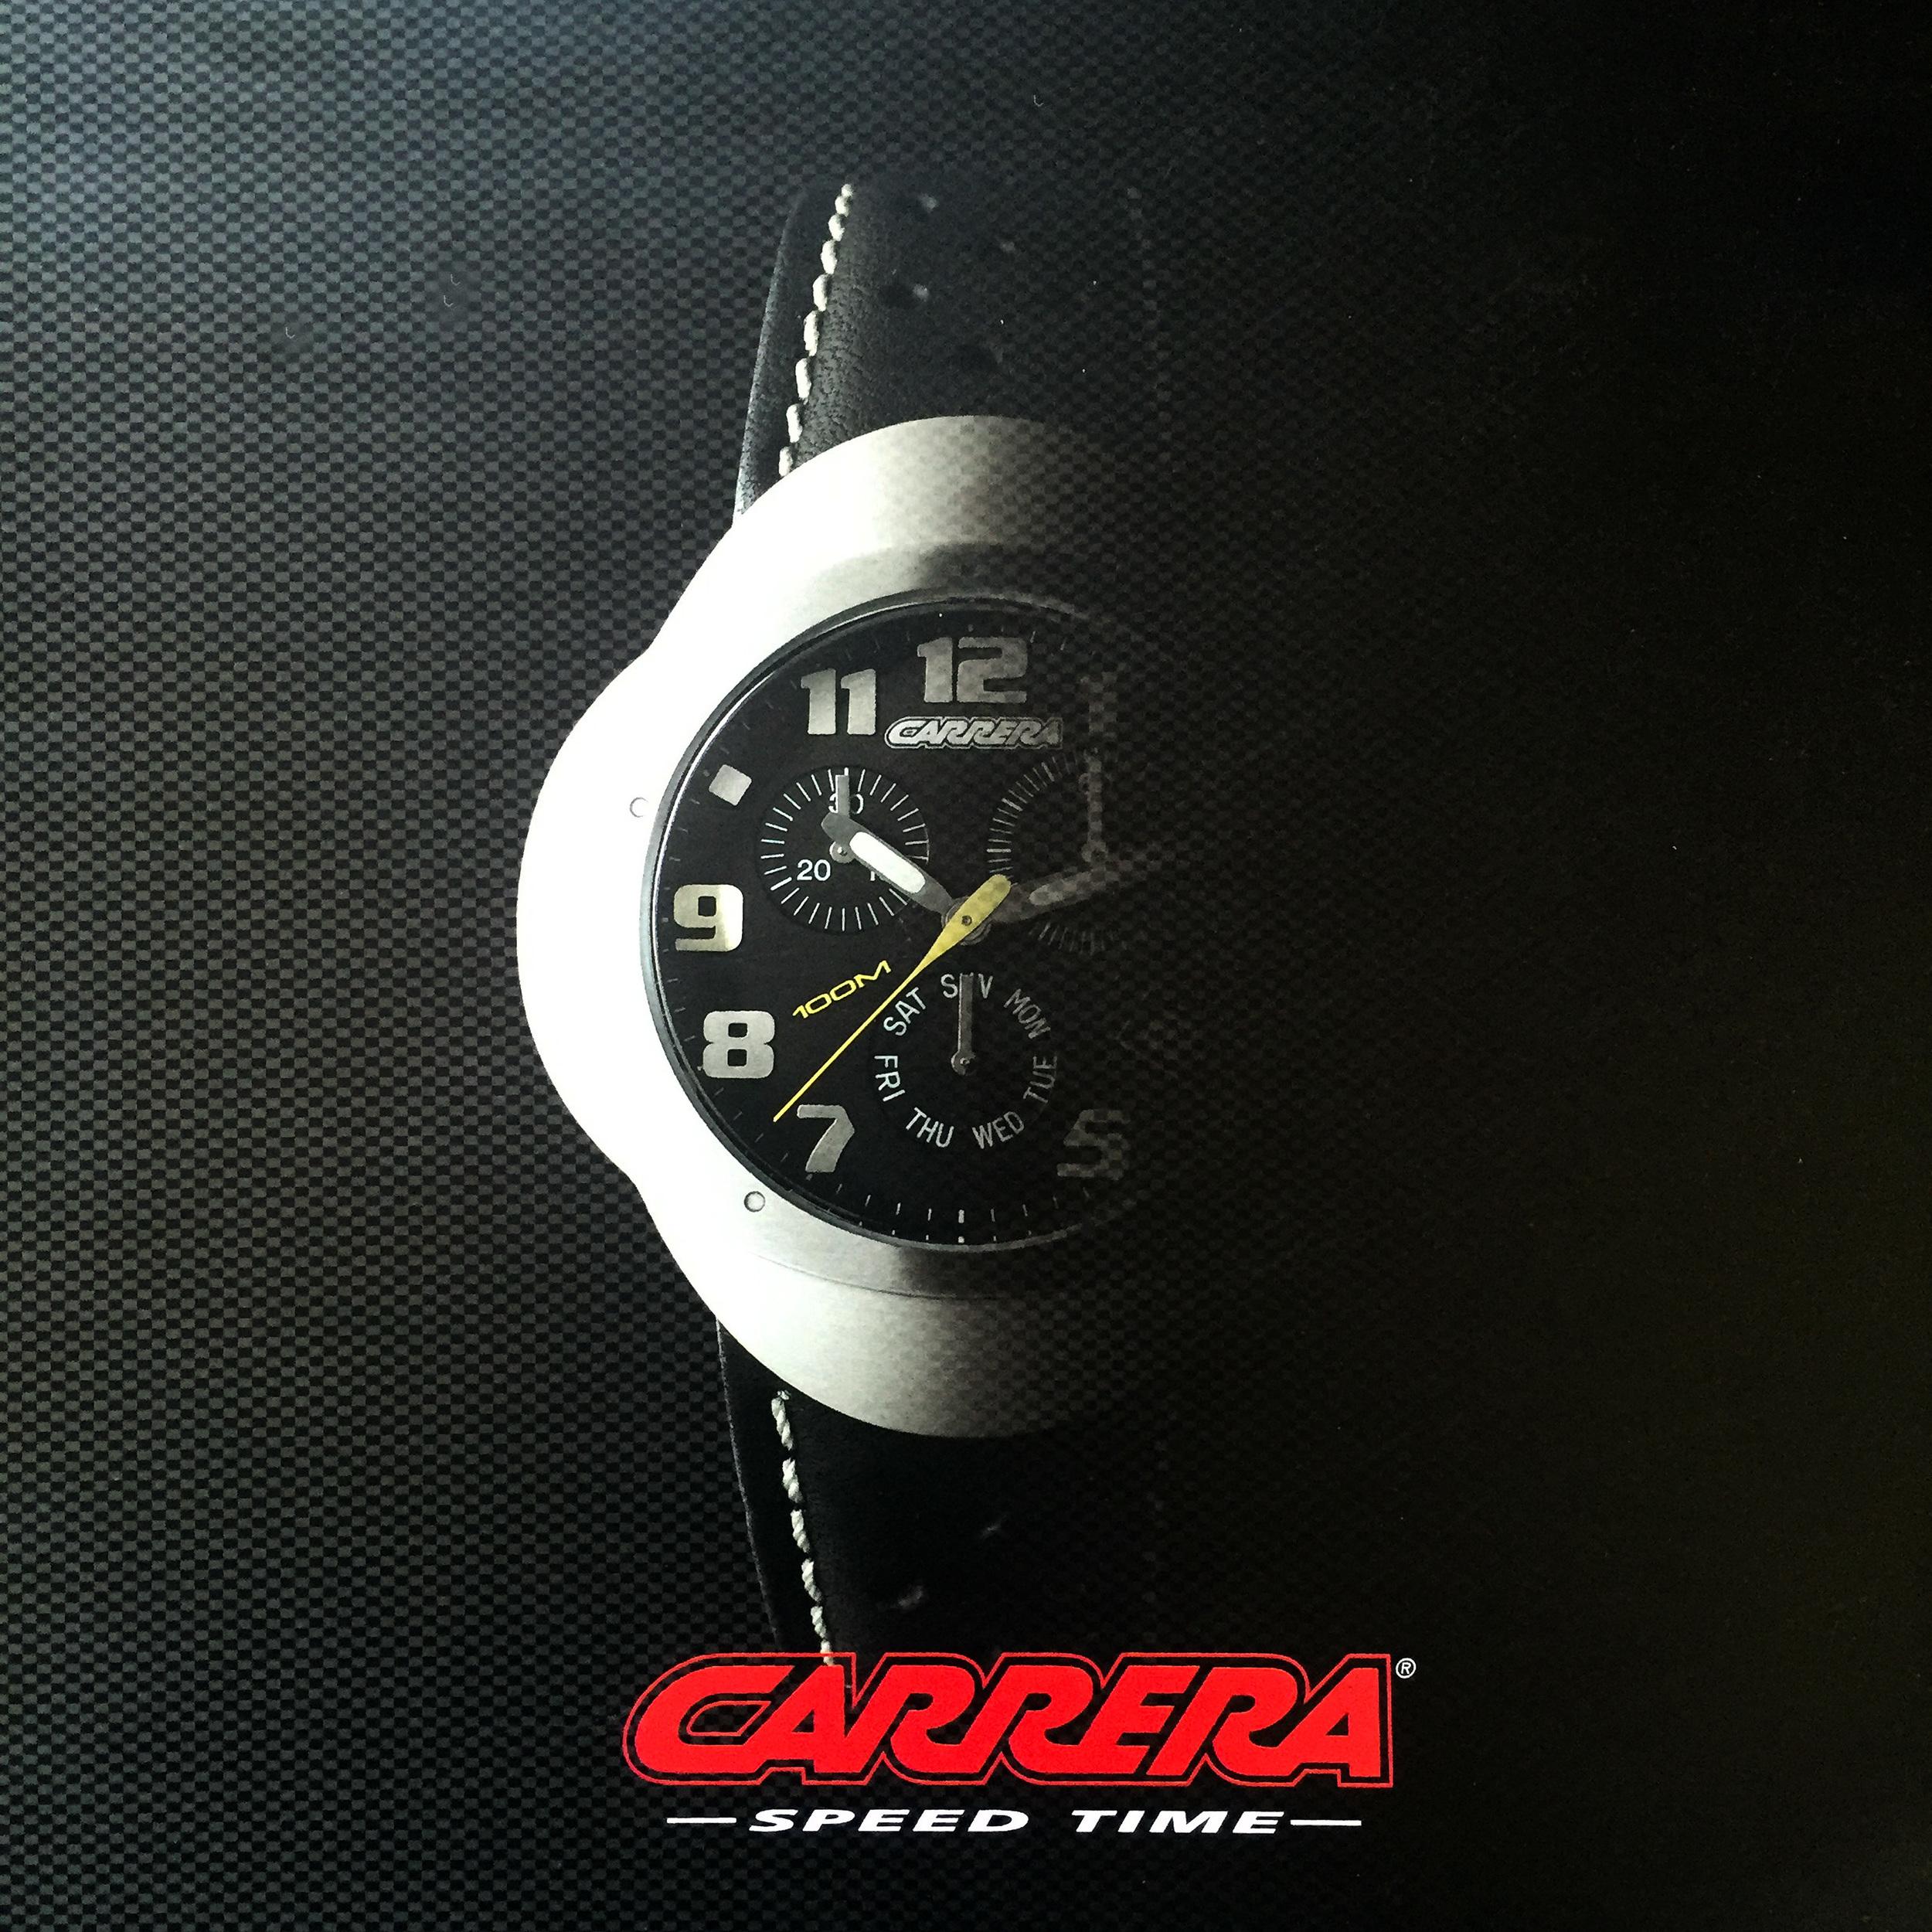 Carrera Speed Time.JPG